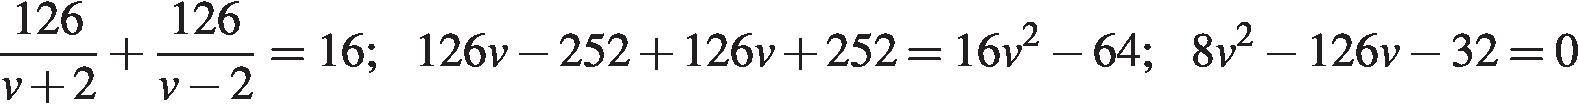 http://sdamgia.ru/formula/48/4893b6c3f51d6b3012351f95b745d8c2p.png